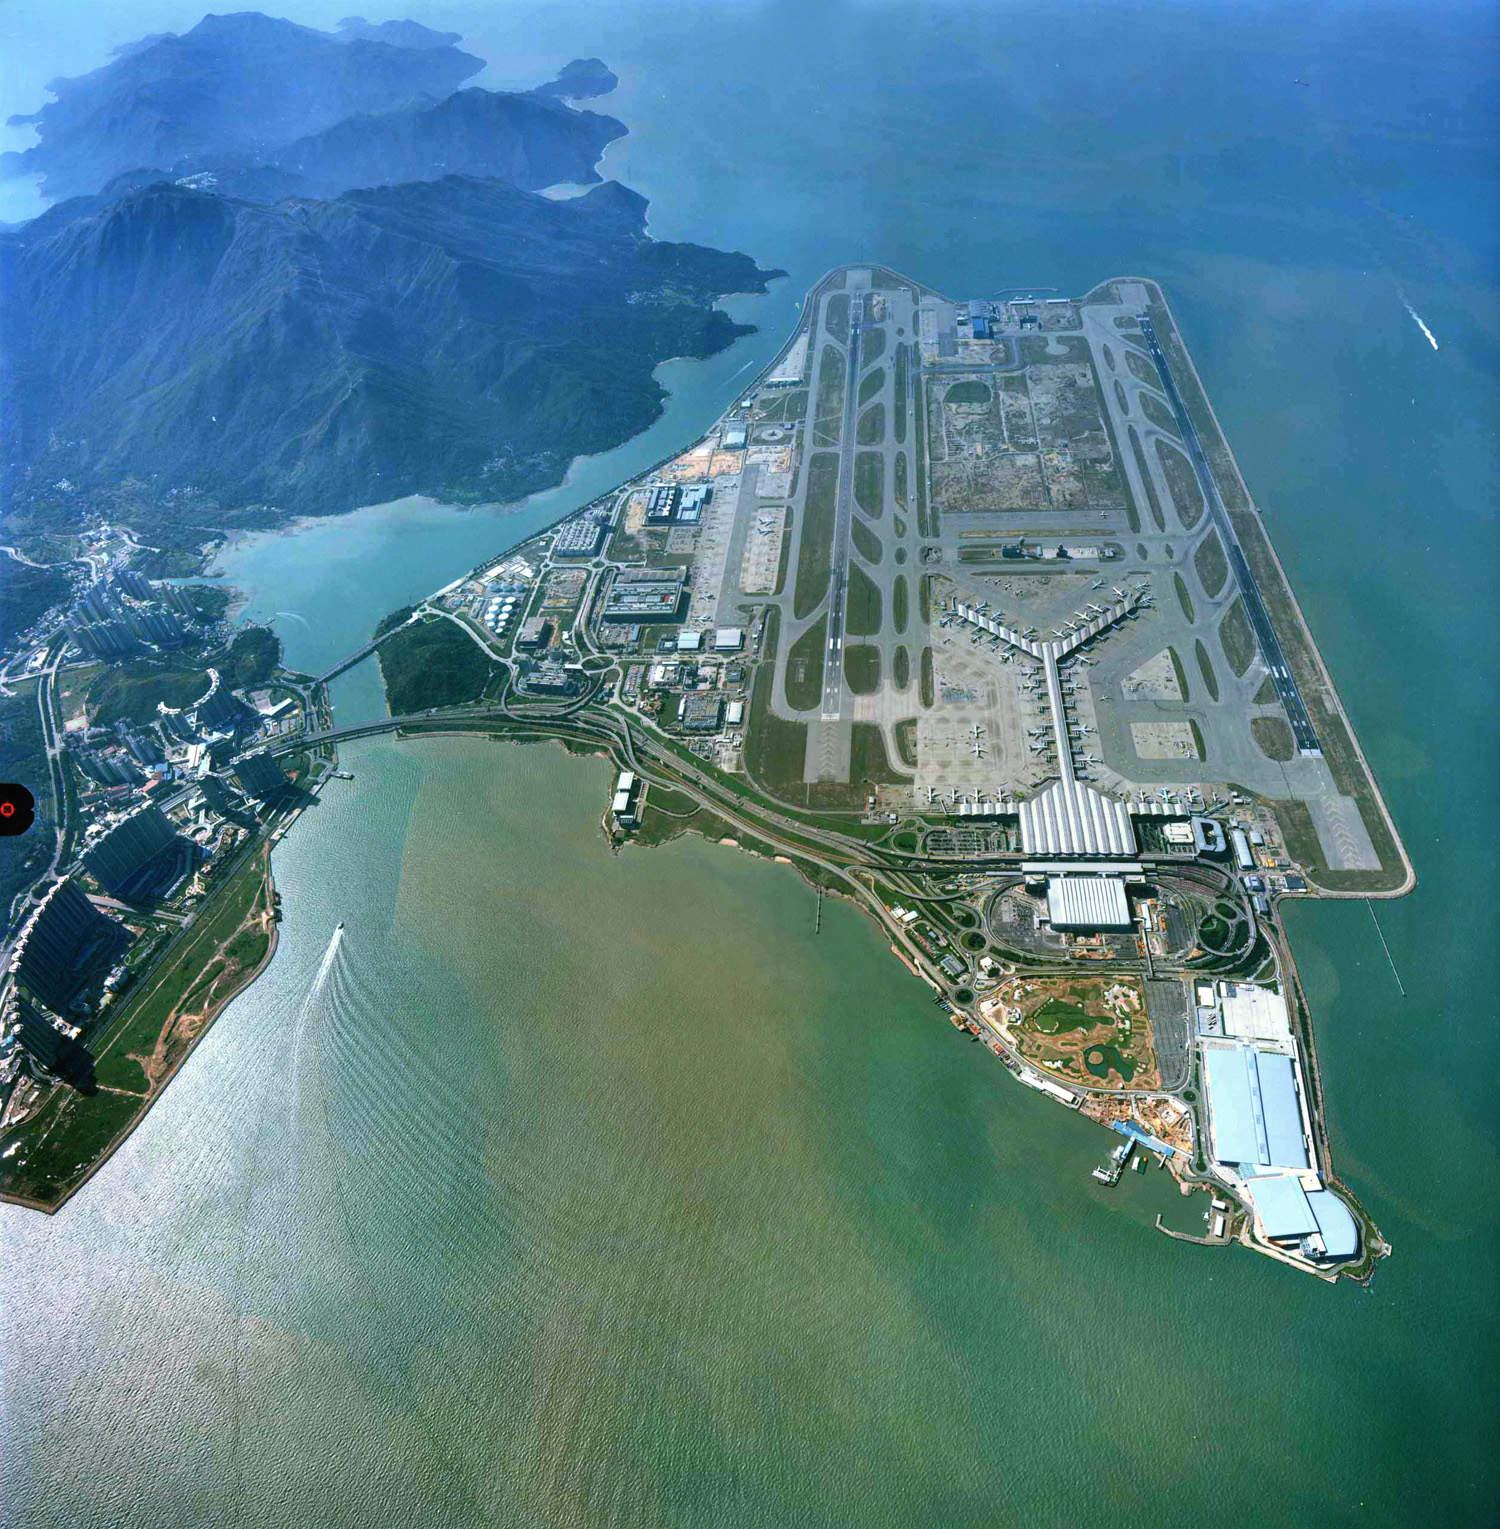 Hong Kong International Airport 2030 Study